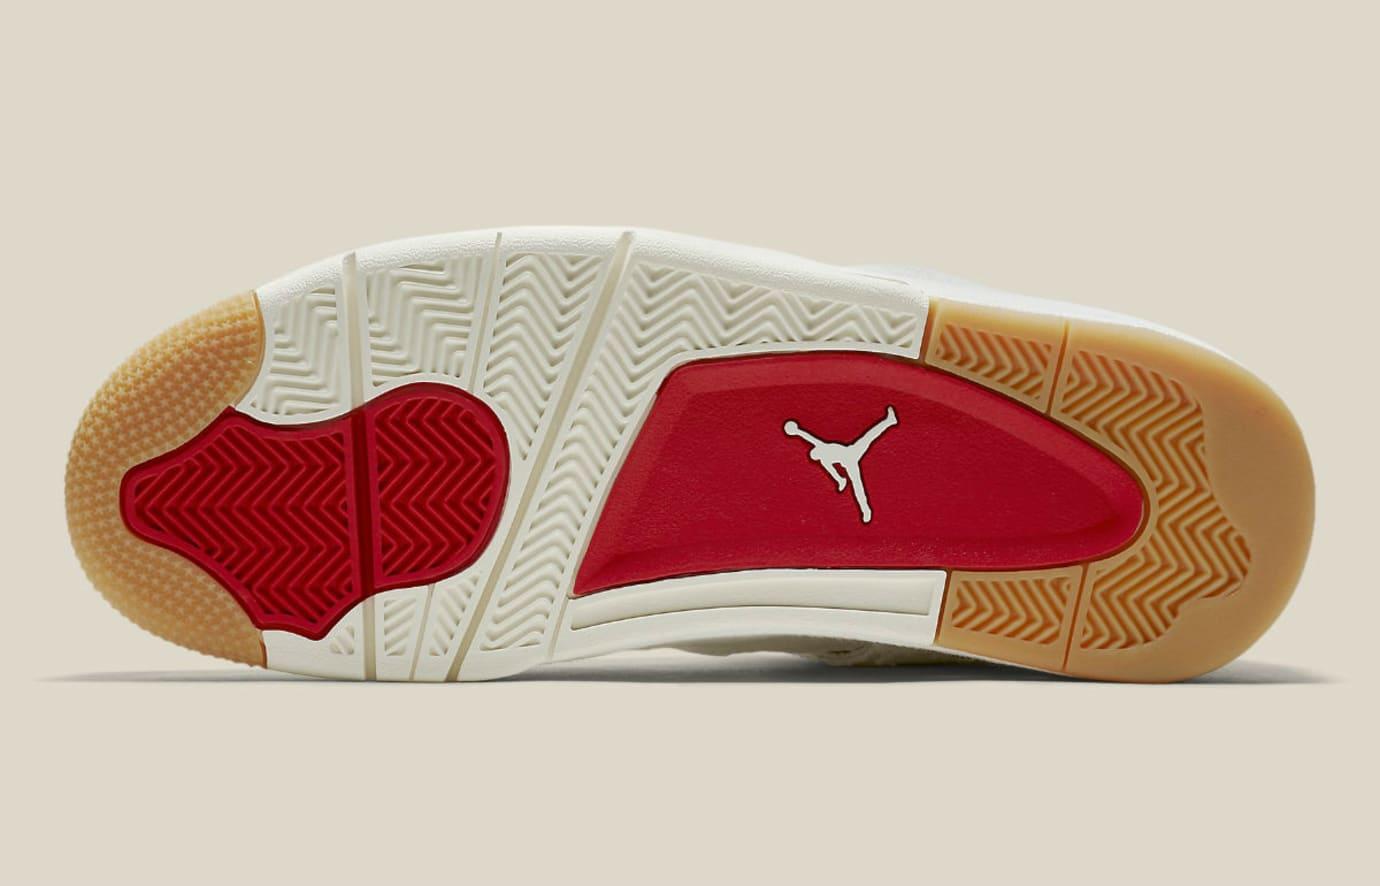 ab3cb2286e01 Image via Nike Levi s x Air Jordan 4 White Demin Release Date AO2571-100  Sole